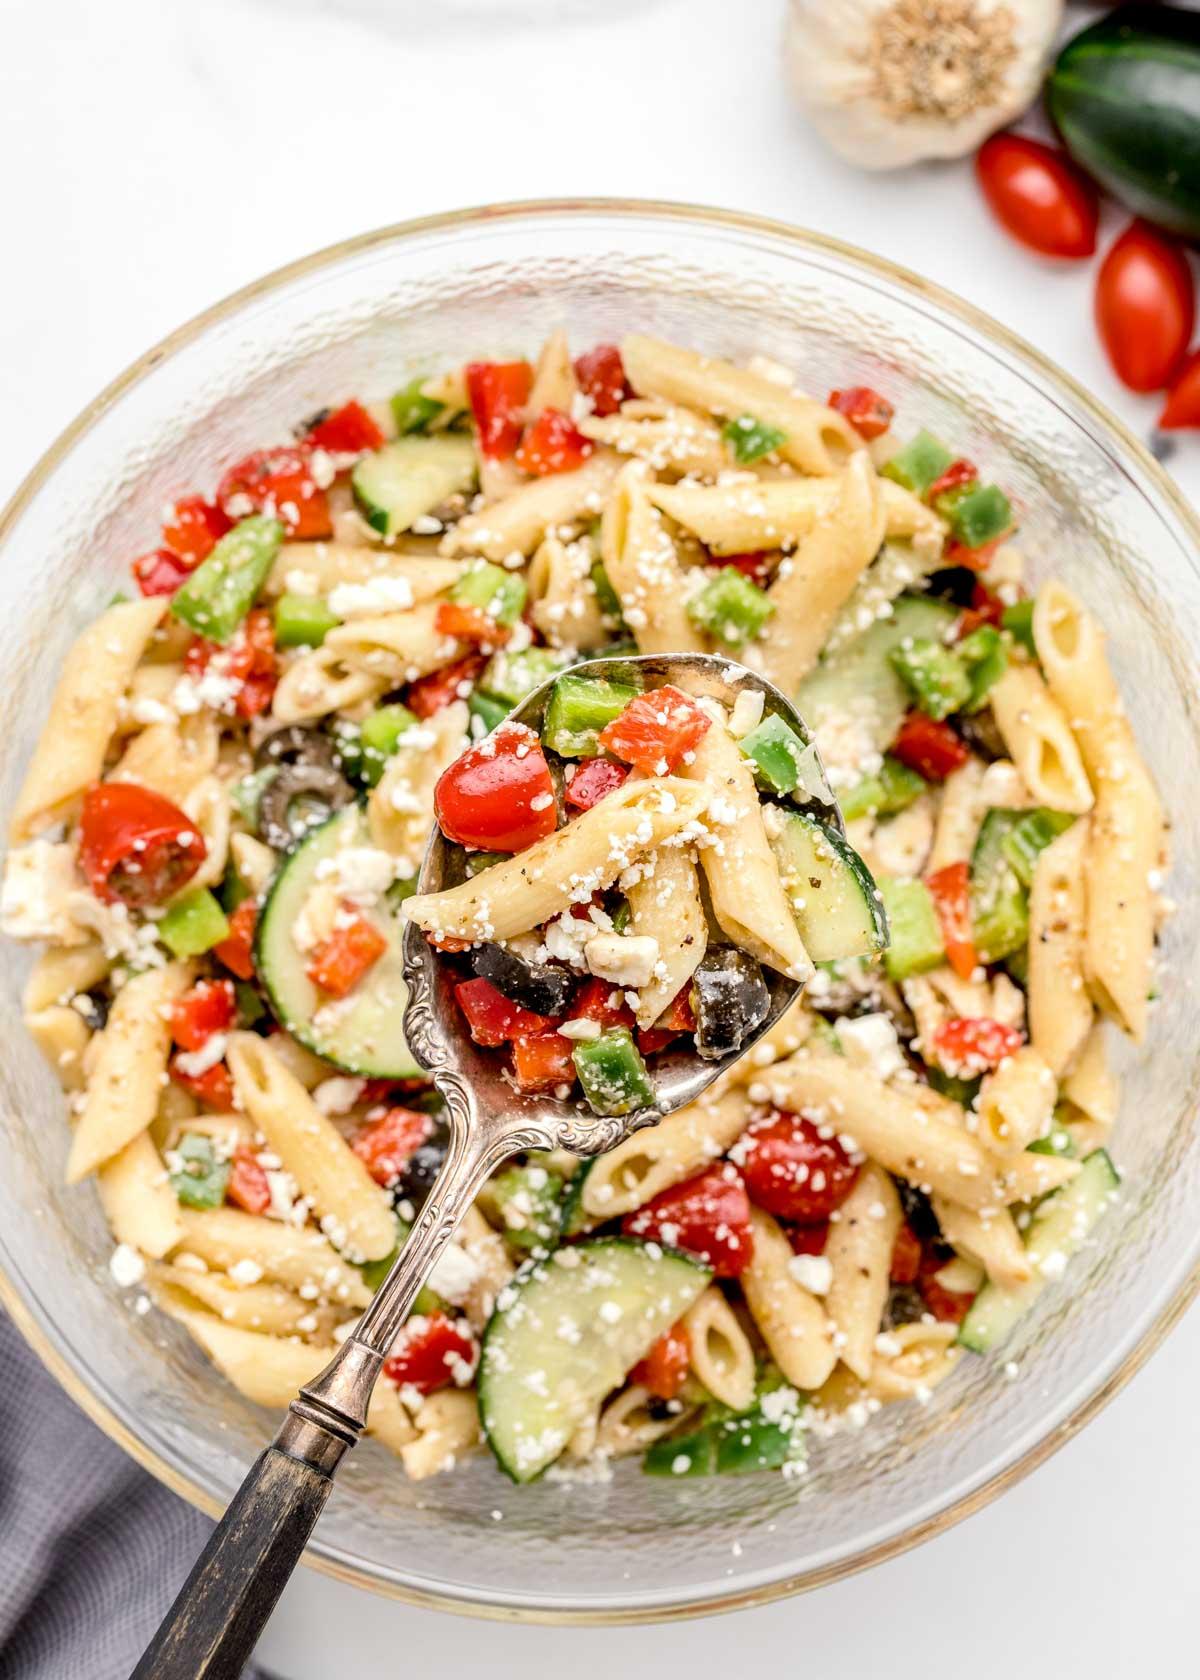 Pasta salad covered in Greek Pasta Salad Dressing